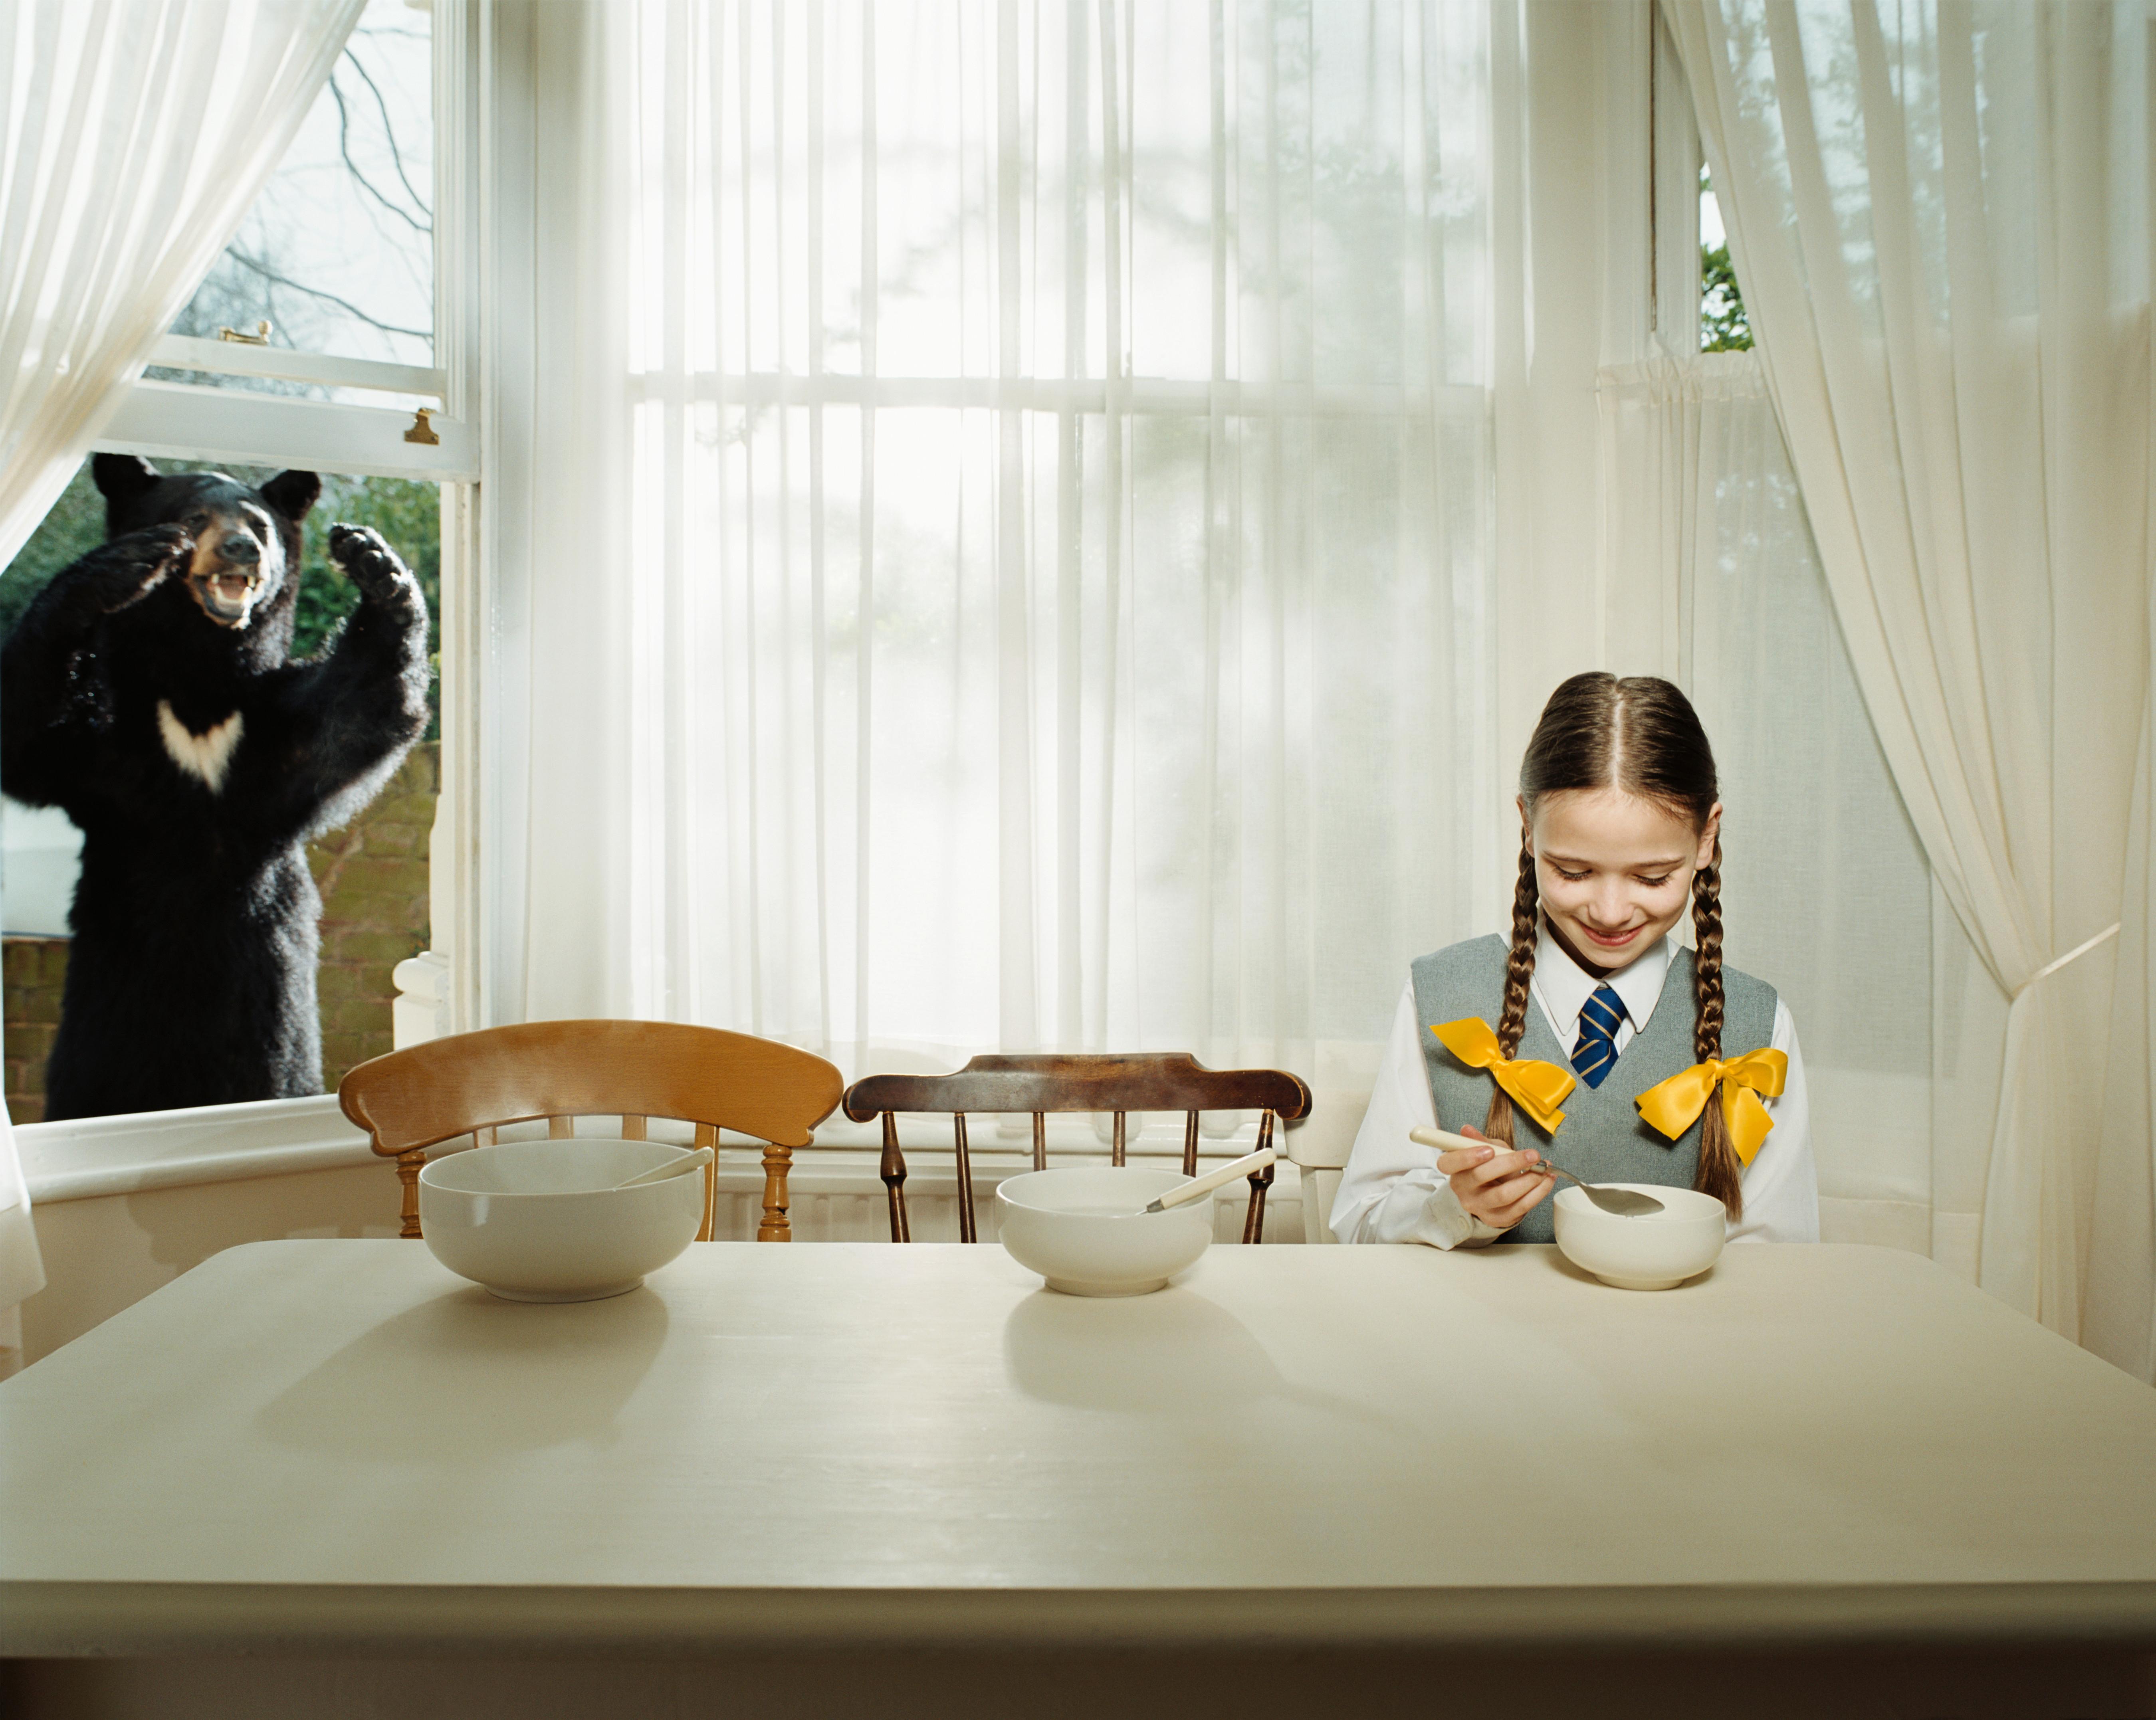 Goldilocks eats porridge while a bear looks through a window.